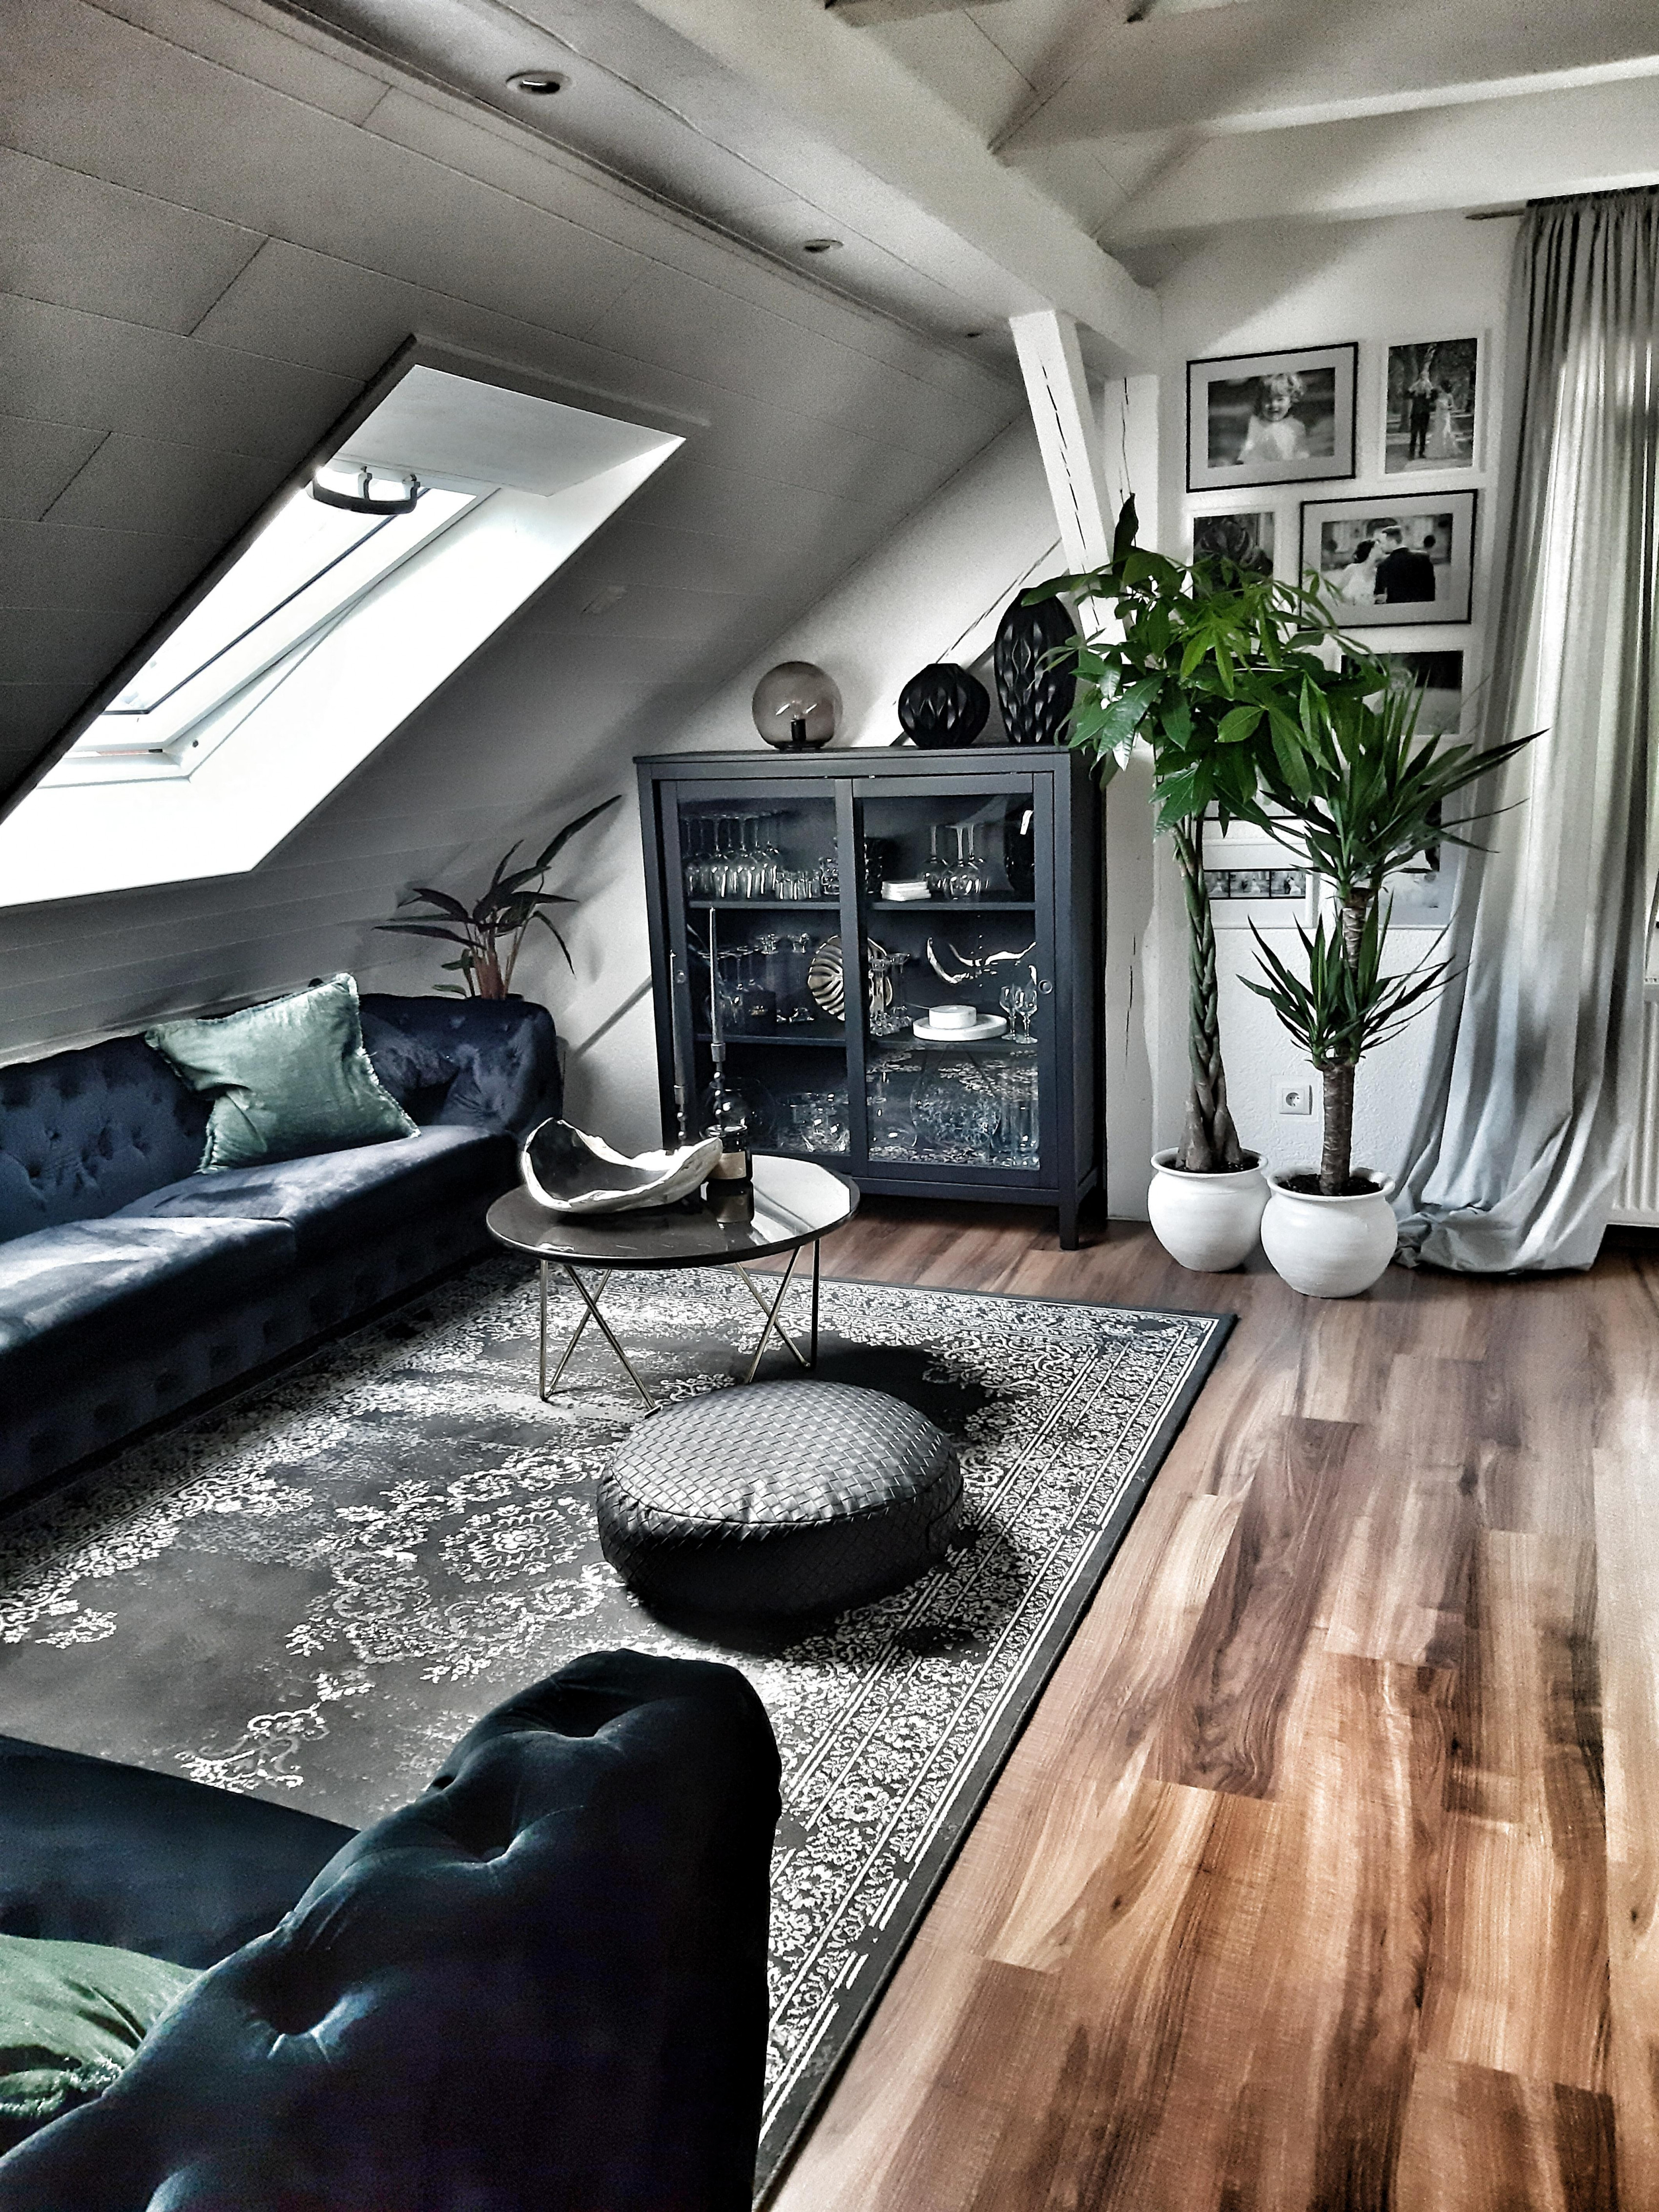 Dachgeschoss Schlafzimmer Ideen – Caseconrad von Wohnzimmer Ideen Dachgeschoss Photo